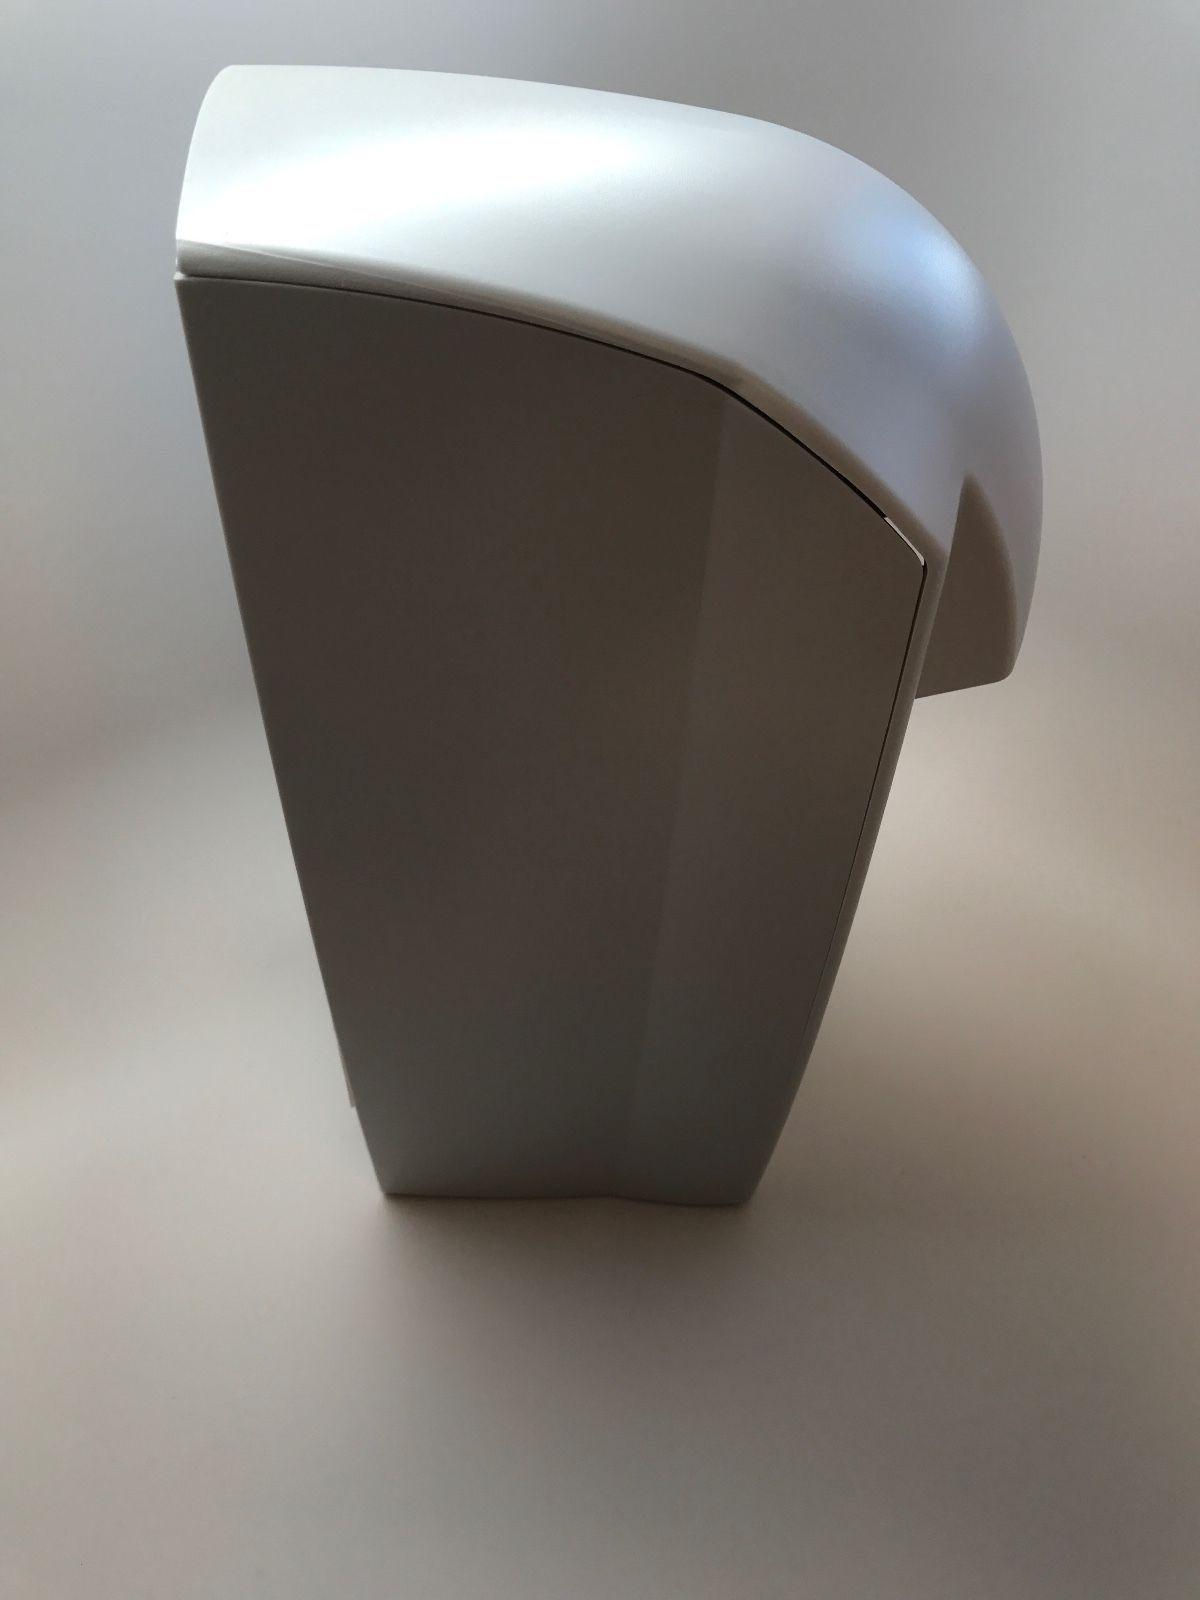 2 ea. Sanitizer Dispenser, EZ Hand Hygiene No Touch, # 9960GRA